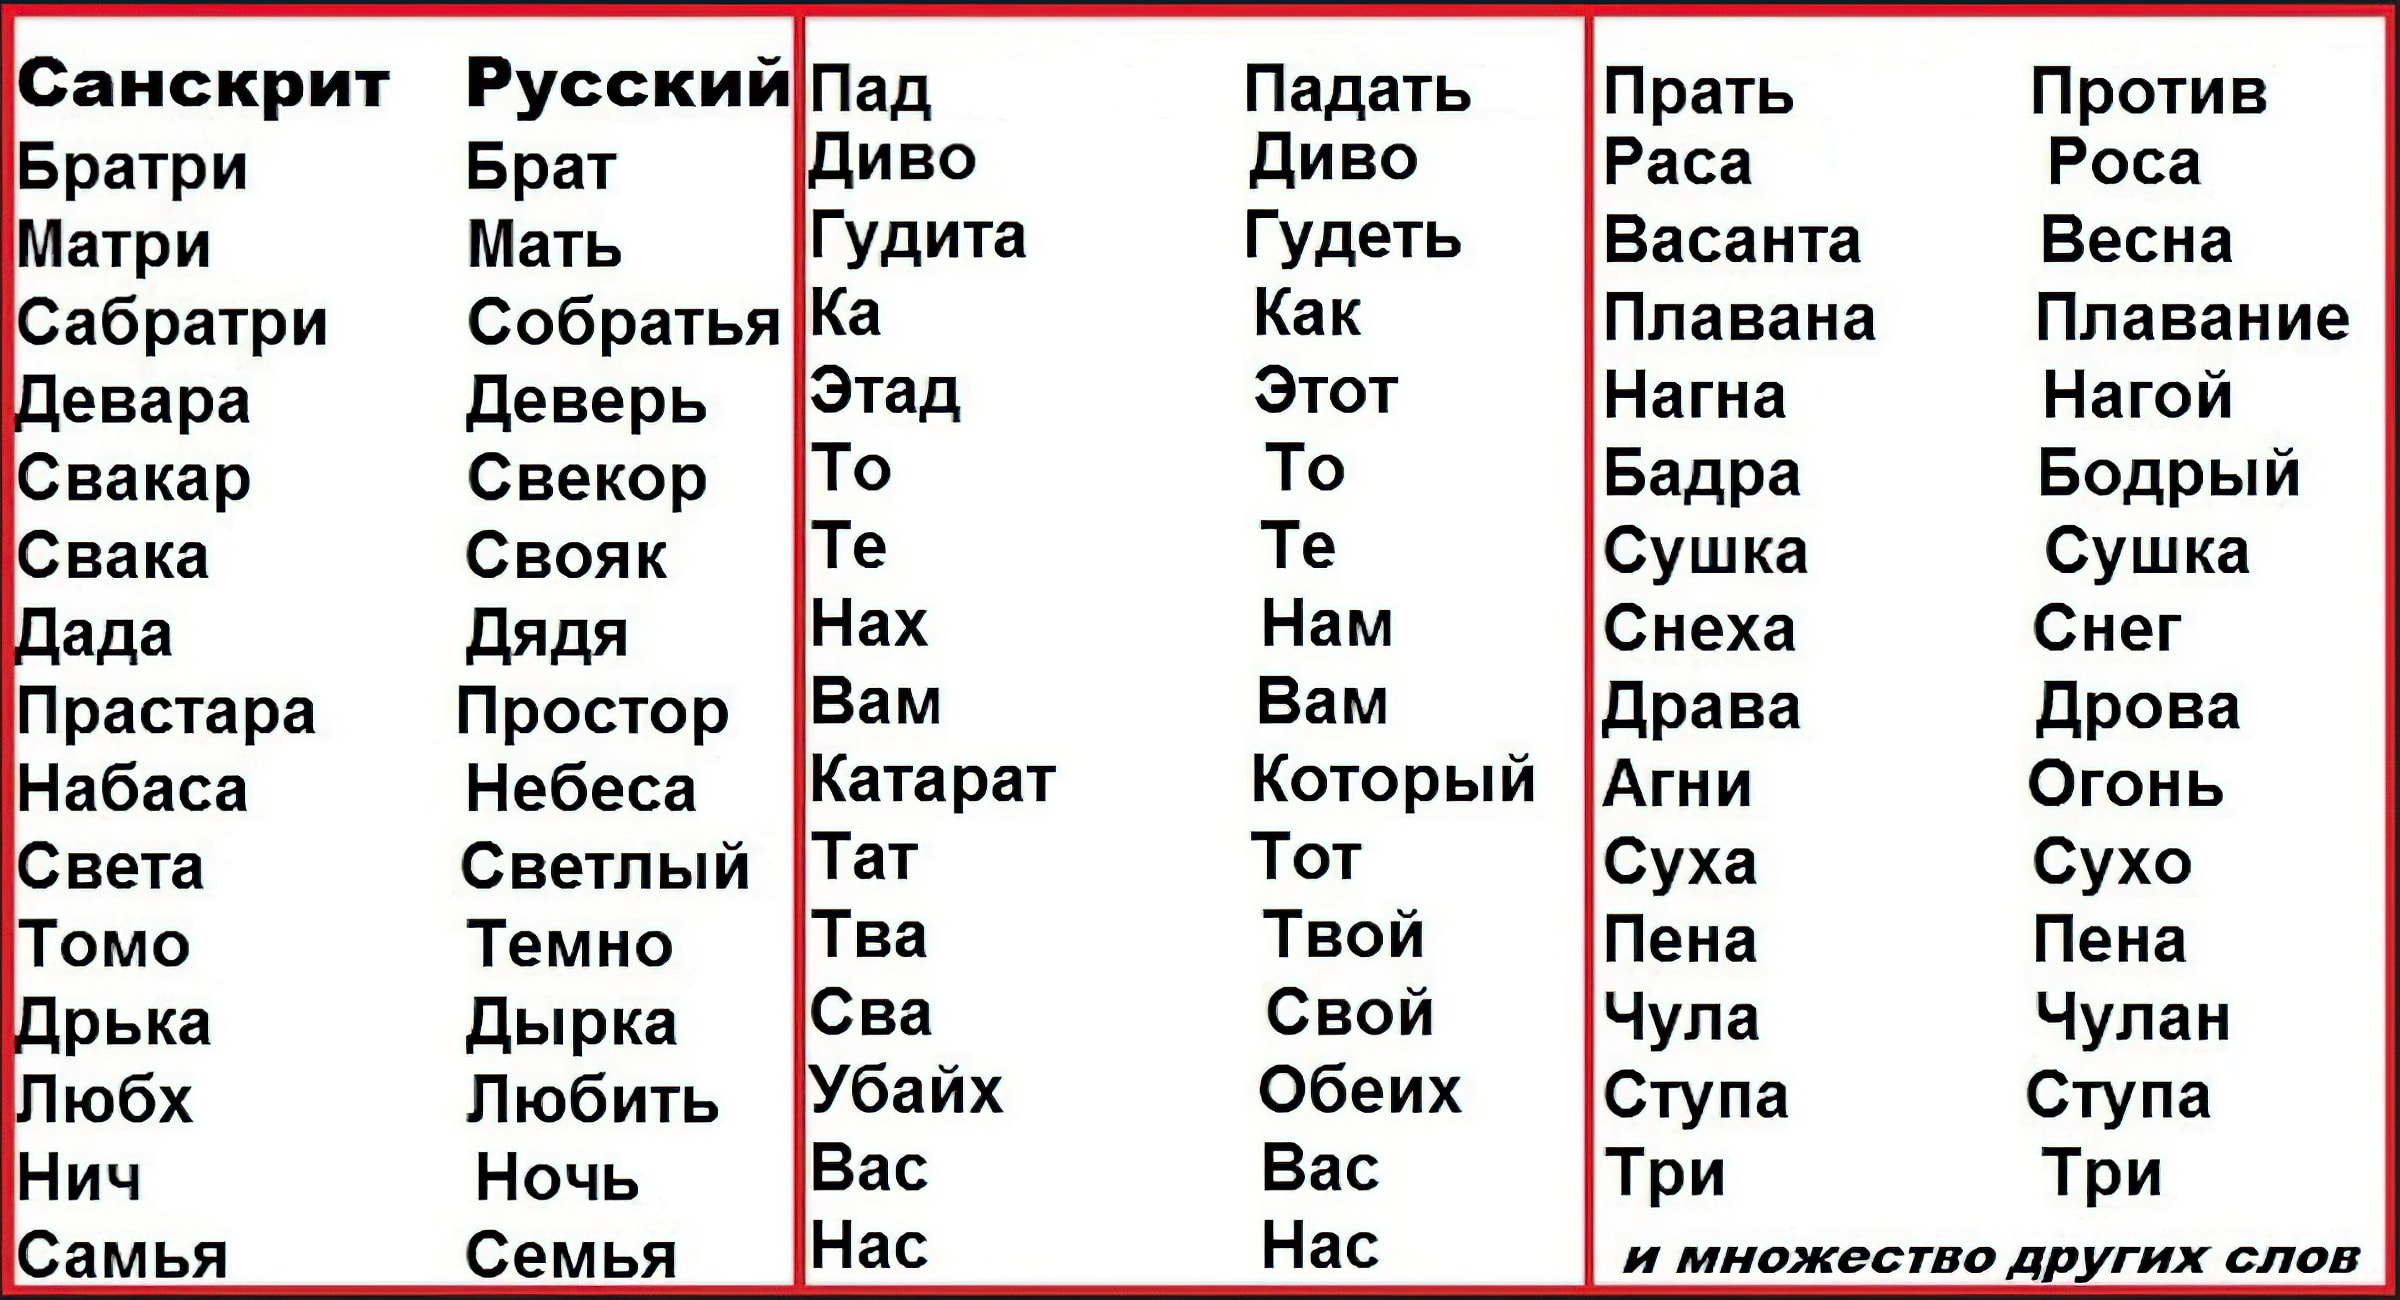 sanskrit-i-russkiy-shodstvo.jpg